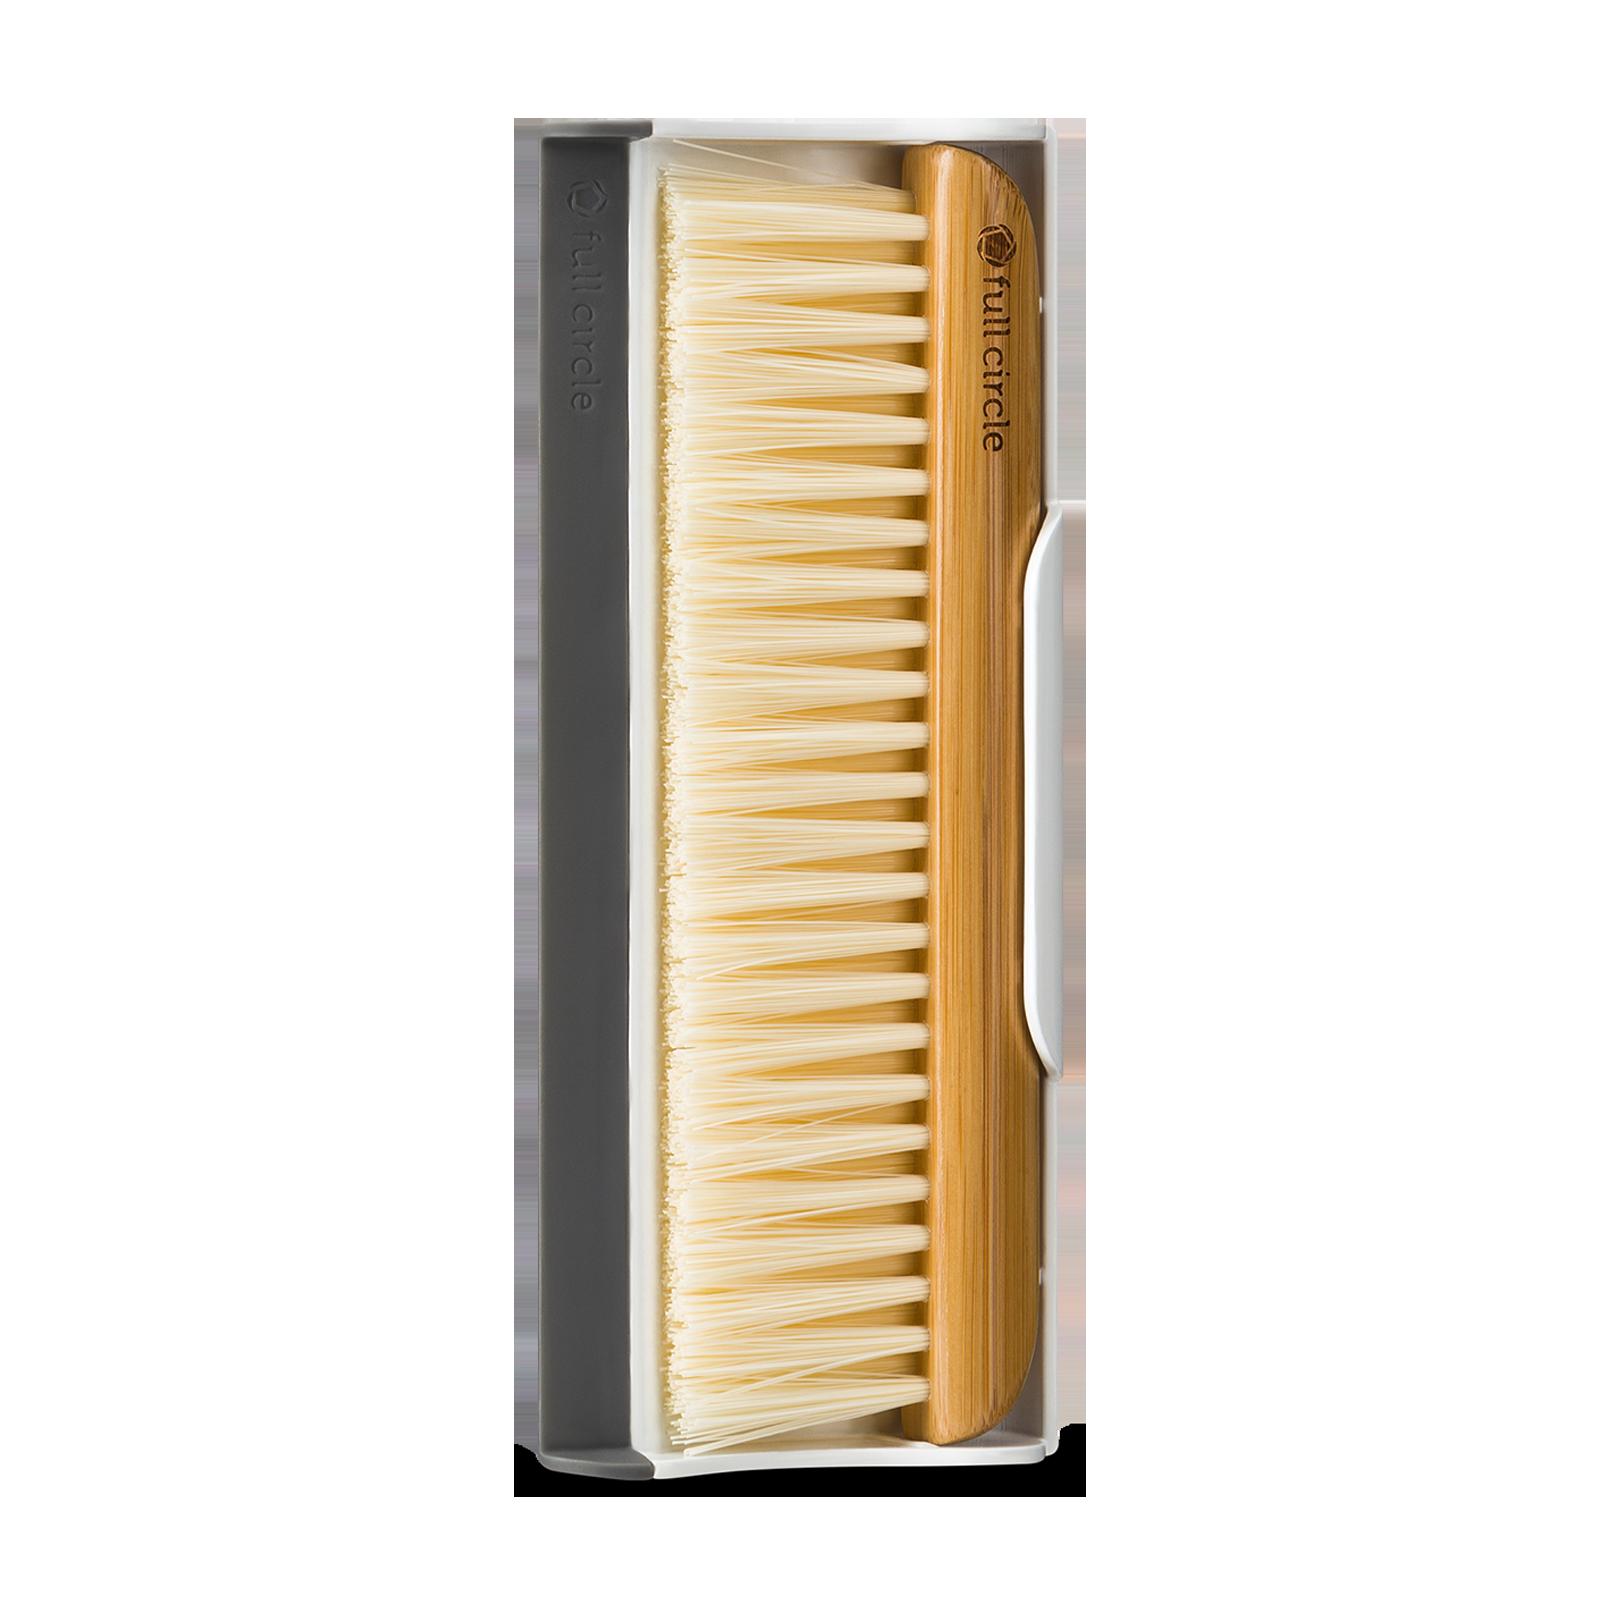 Brush product photography